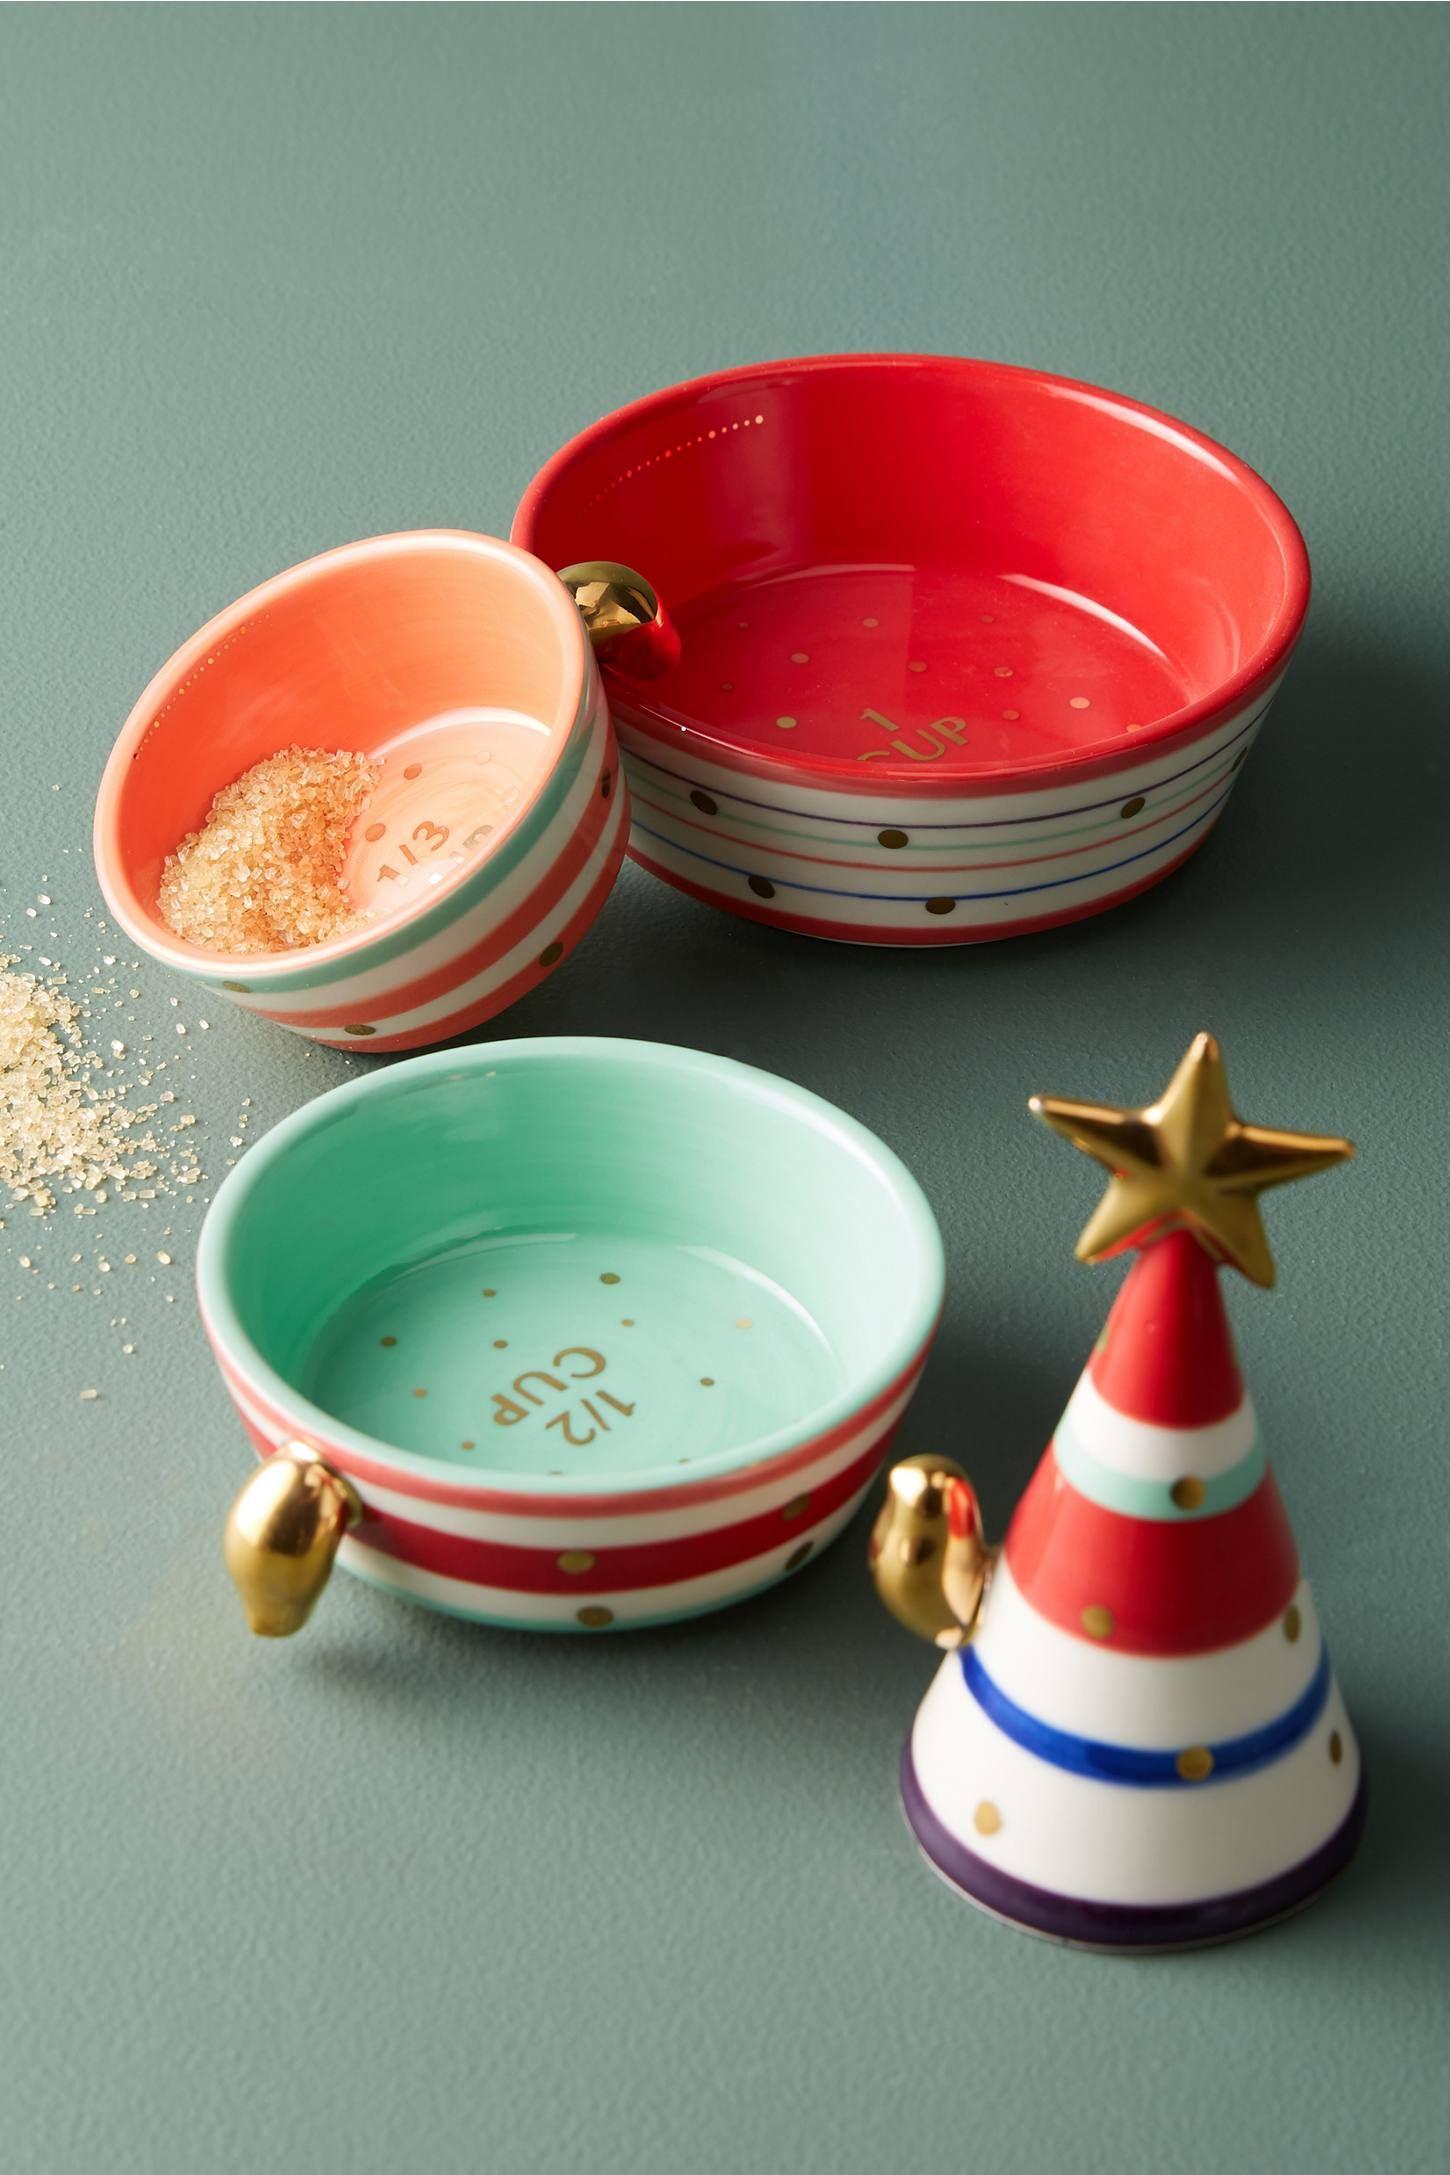 Sugar Cookie Measuring Cups